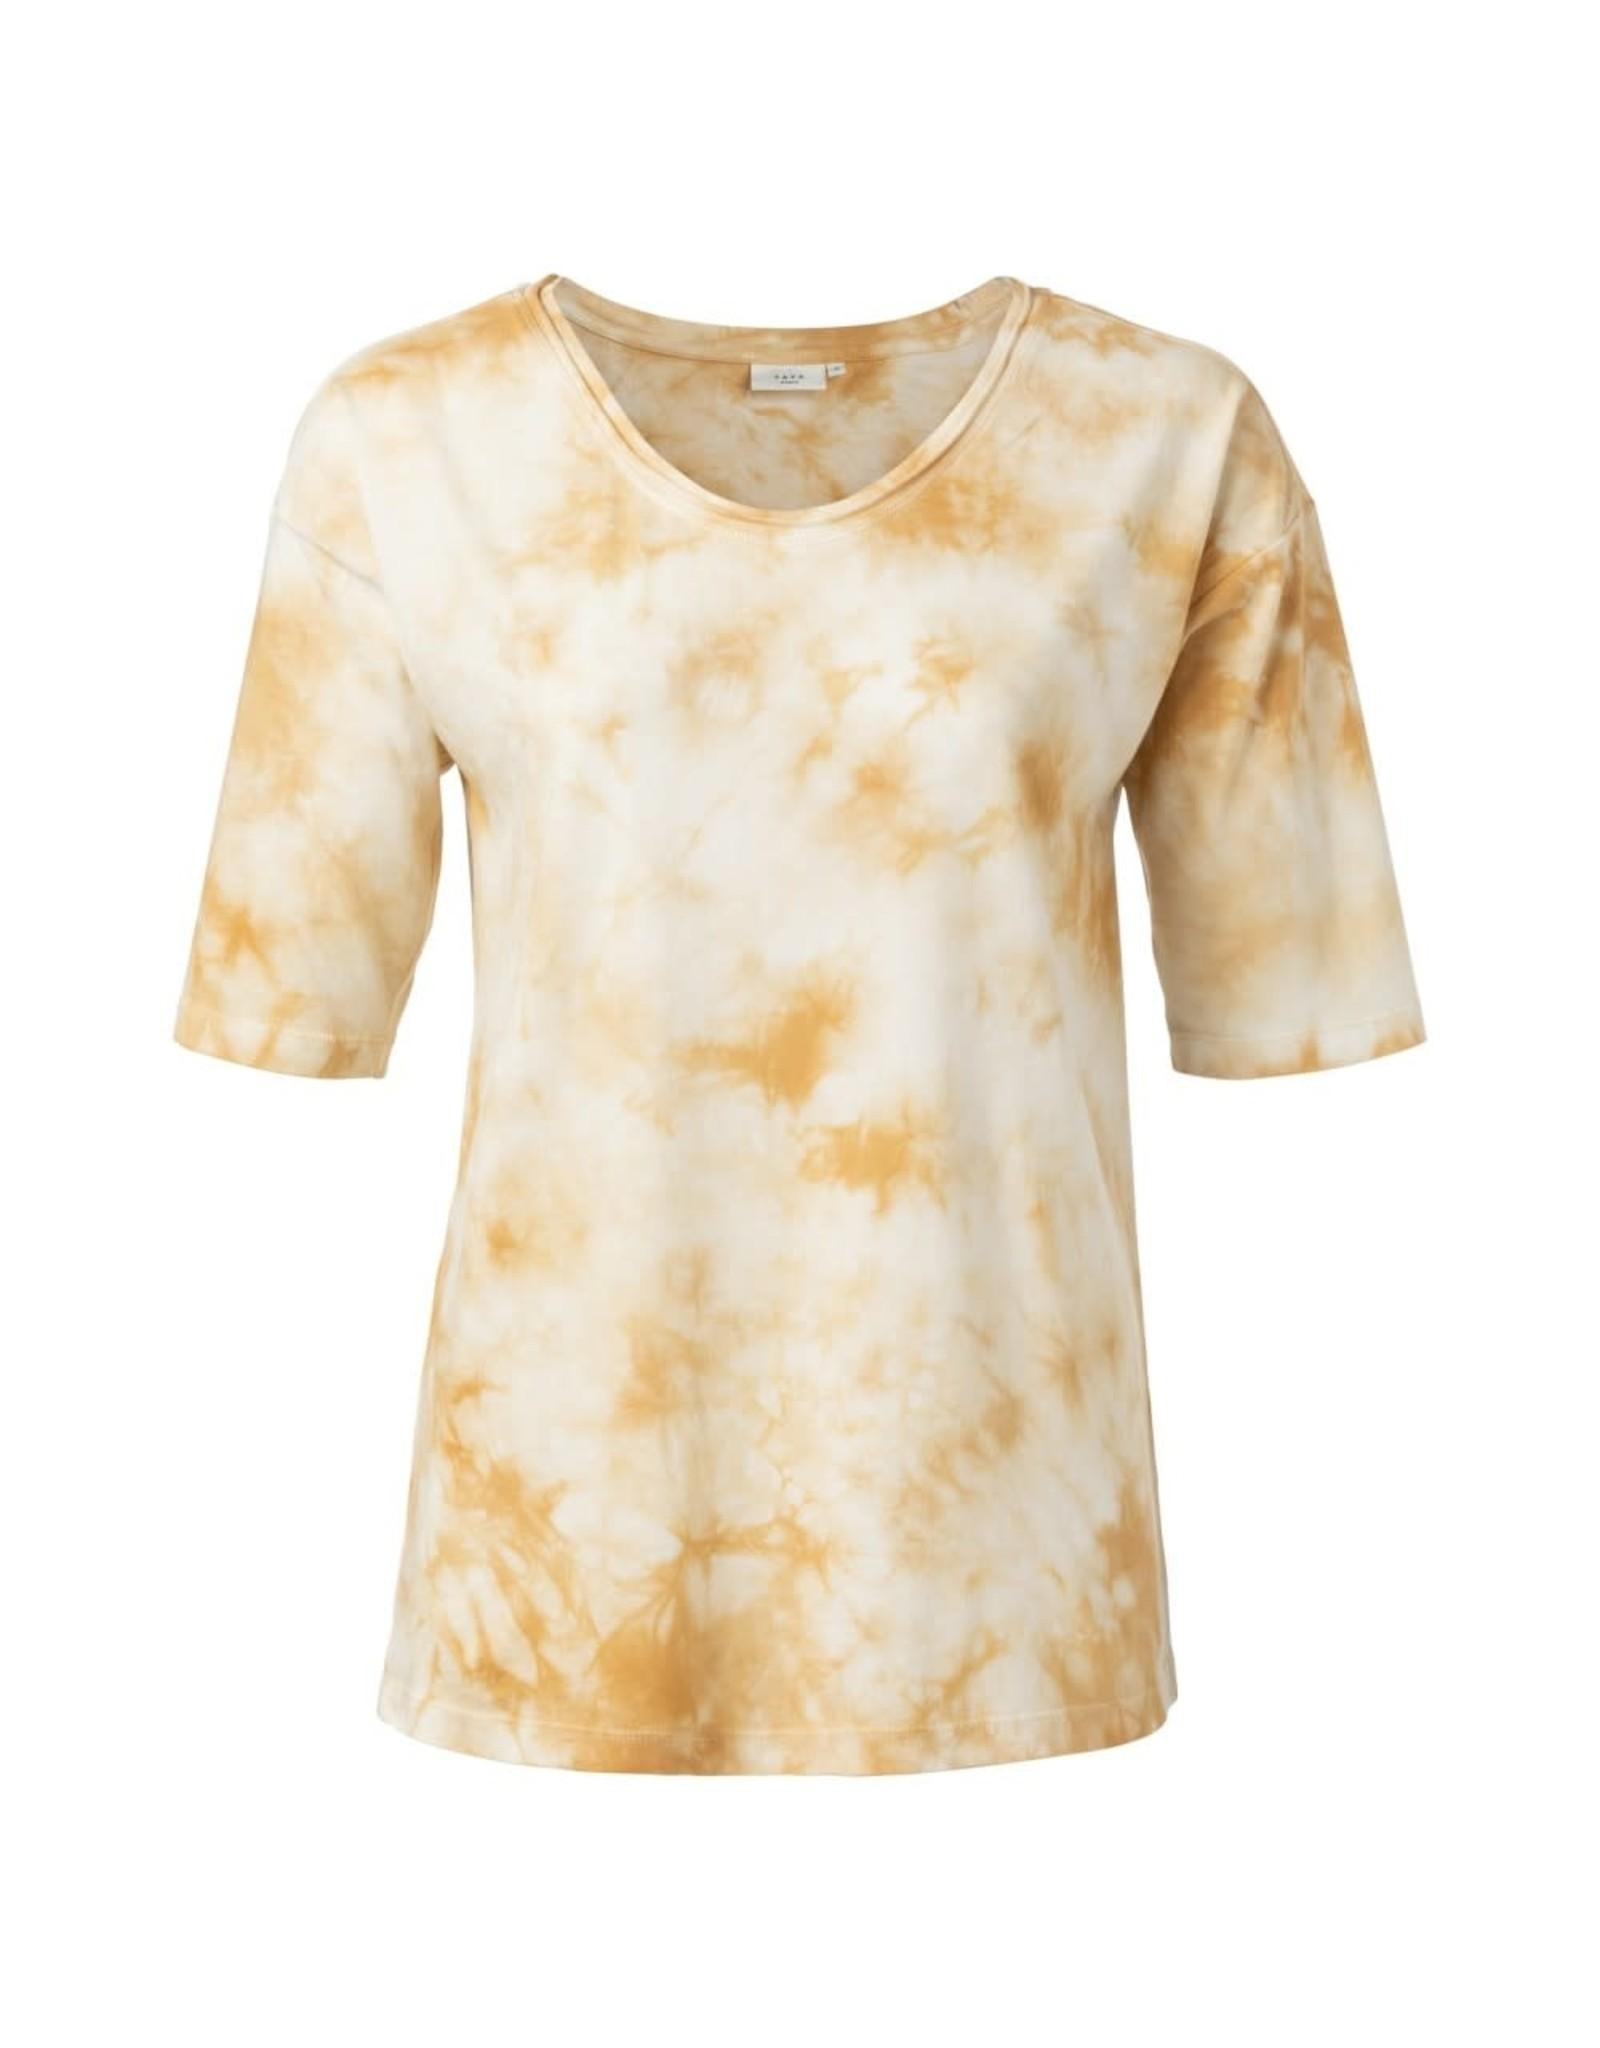 YaYa 1919111 T-shirt Tie dye